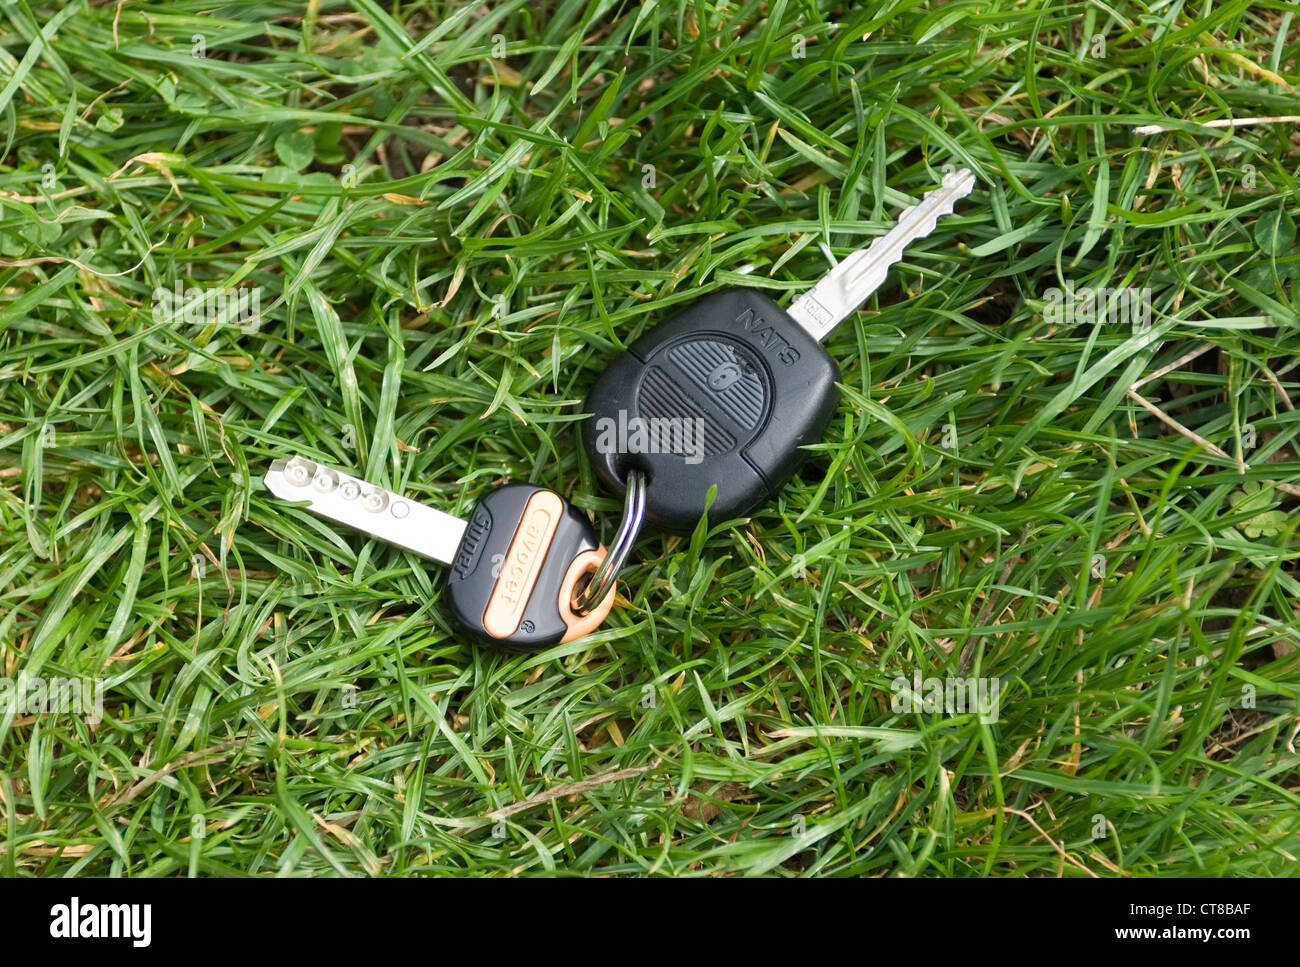 verlorene Autoschlüssel und Hausschlüssel an Schlüsselring in Rasen Stockbild